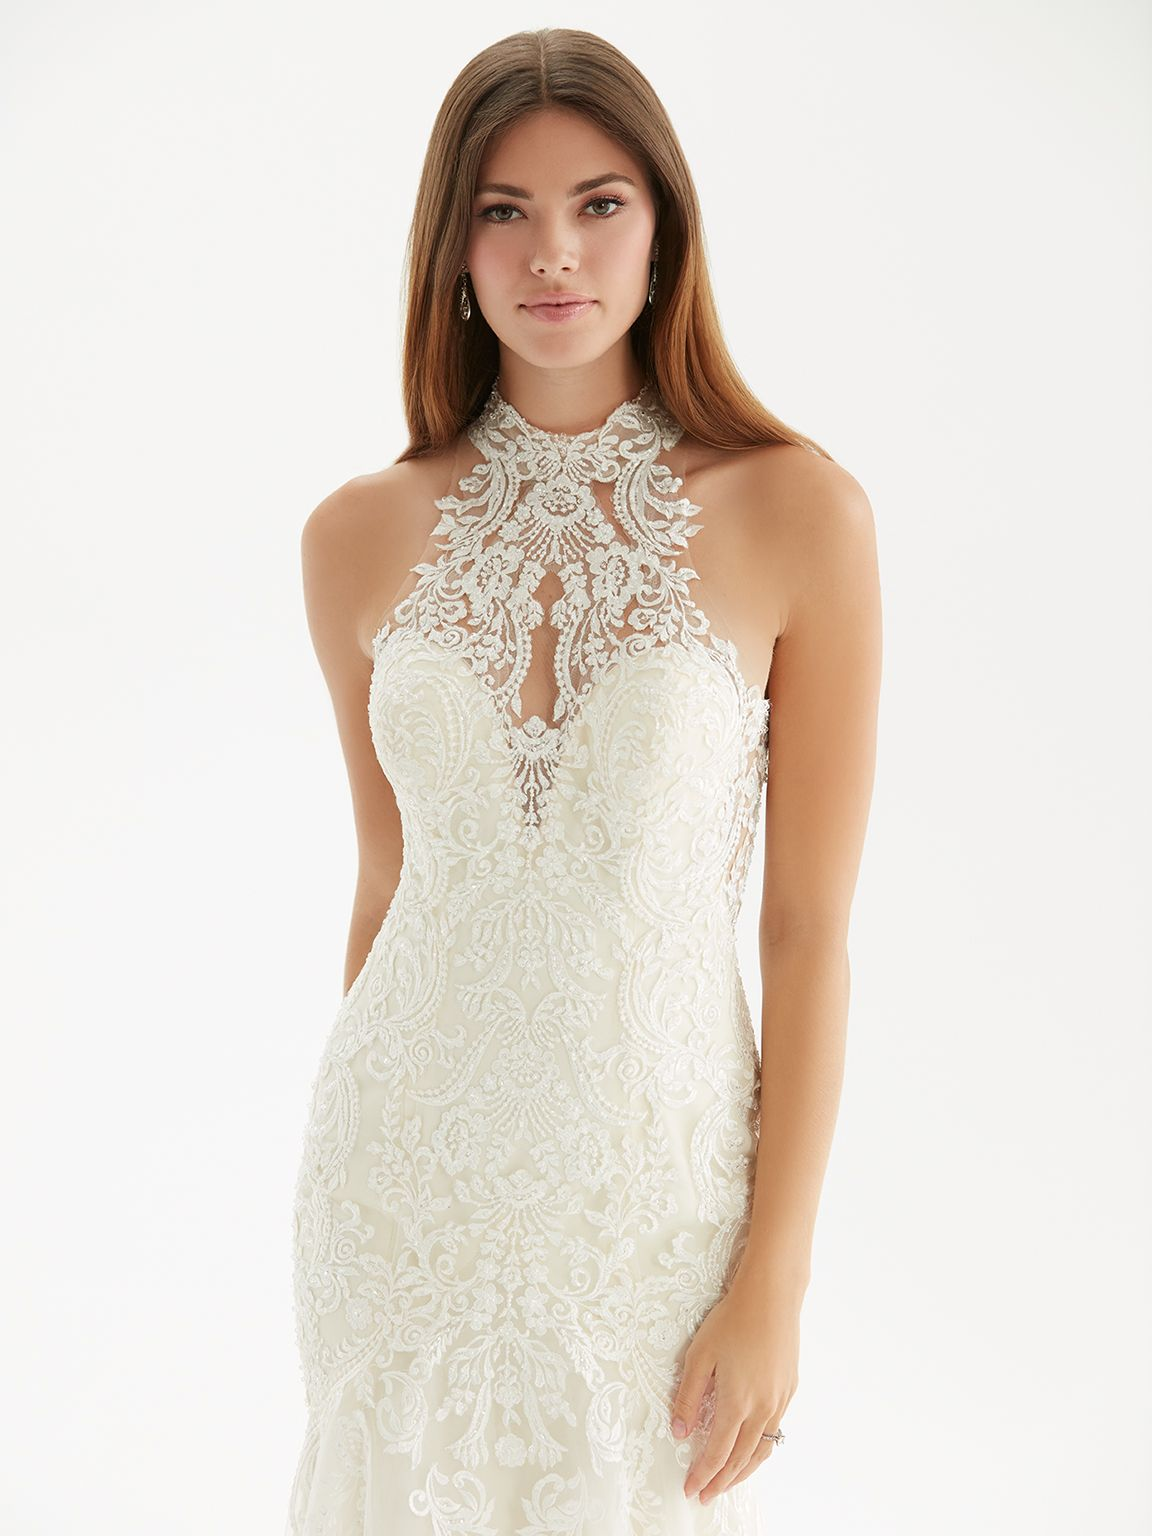 Allure Madison James MJ418 --- New York Bride & Groom {Charlotte ...